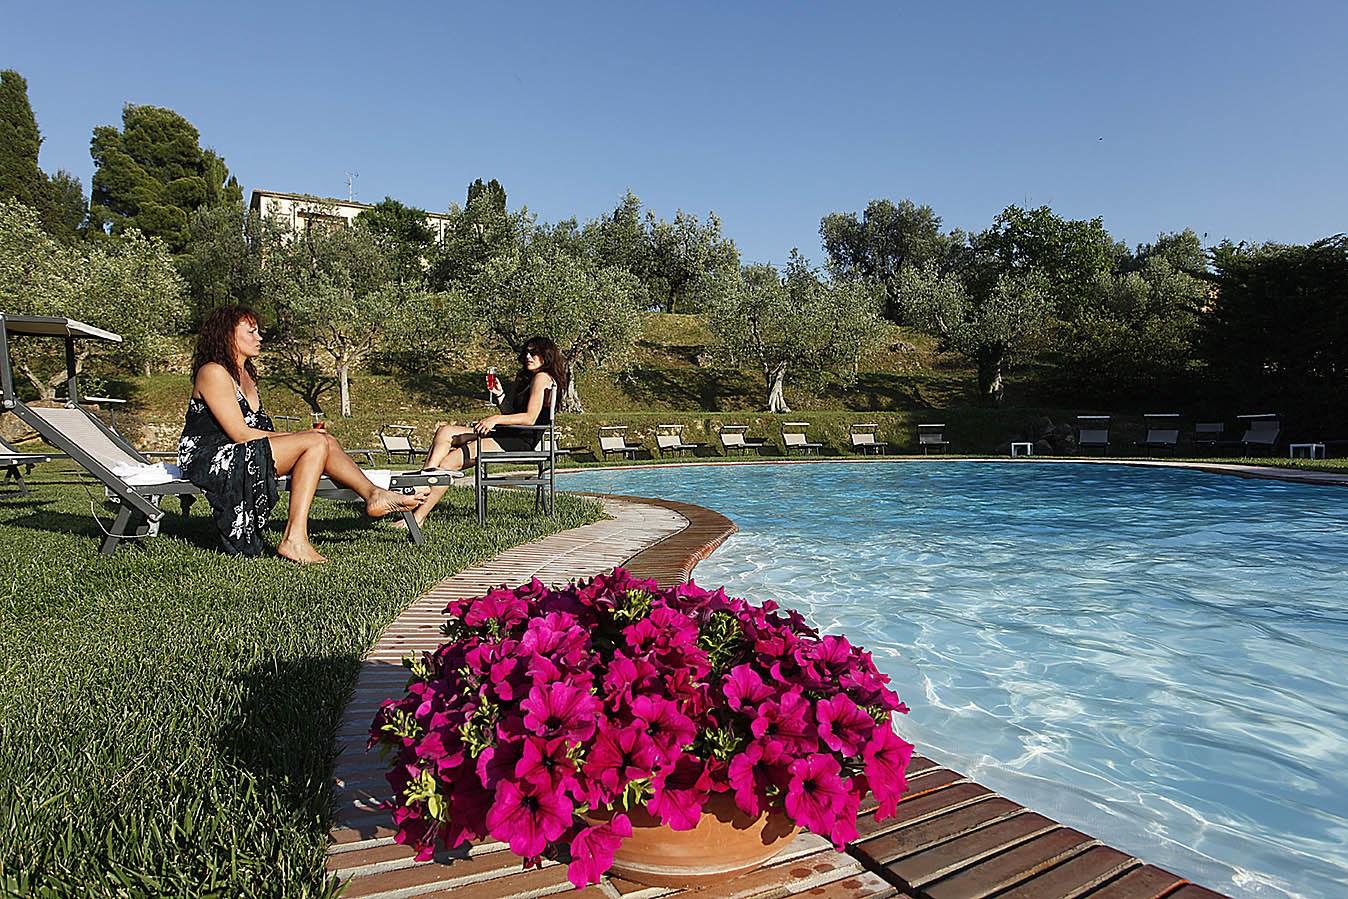 Hotel mit schwimmbad in bolgheri zi martino for Hotel munster mit schwimmbad